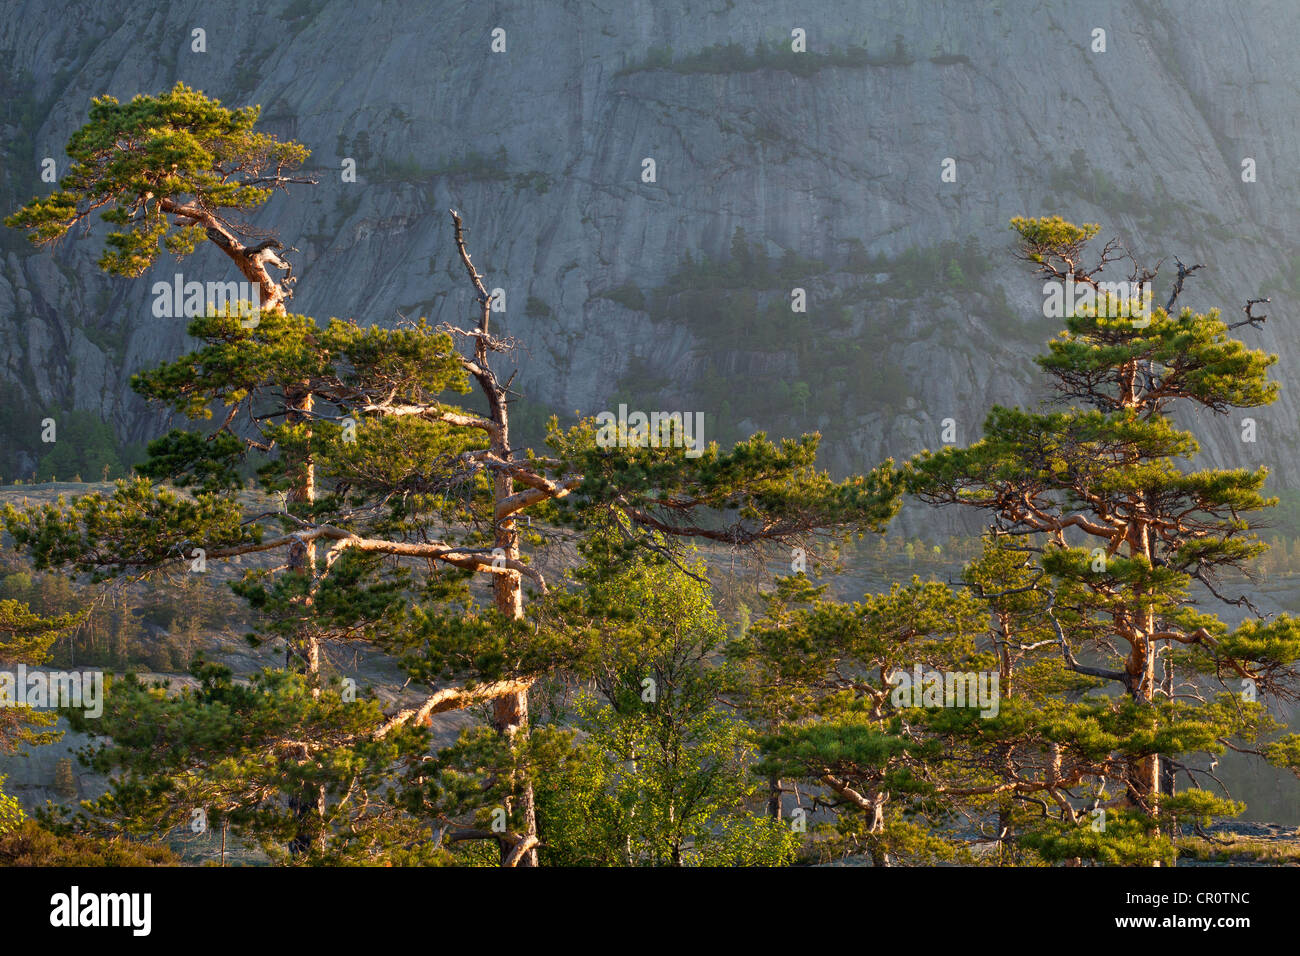 Pinien in der Morgendämmerung, am Måfjell in Nissedal, Telemark Fylke, Norwegen. Stockbild